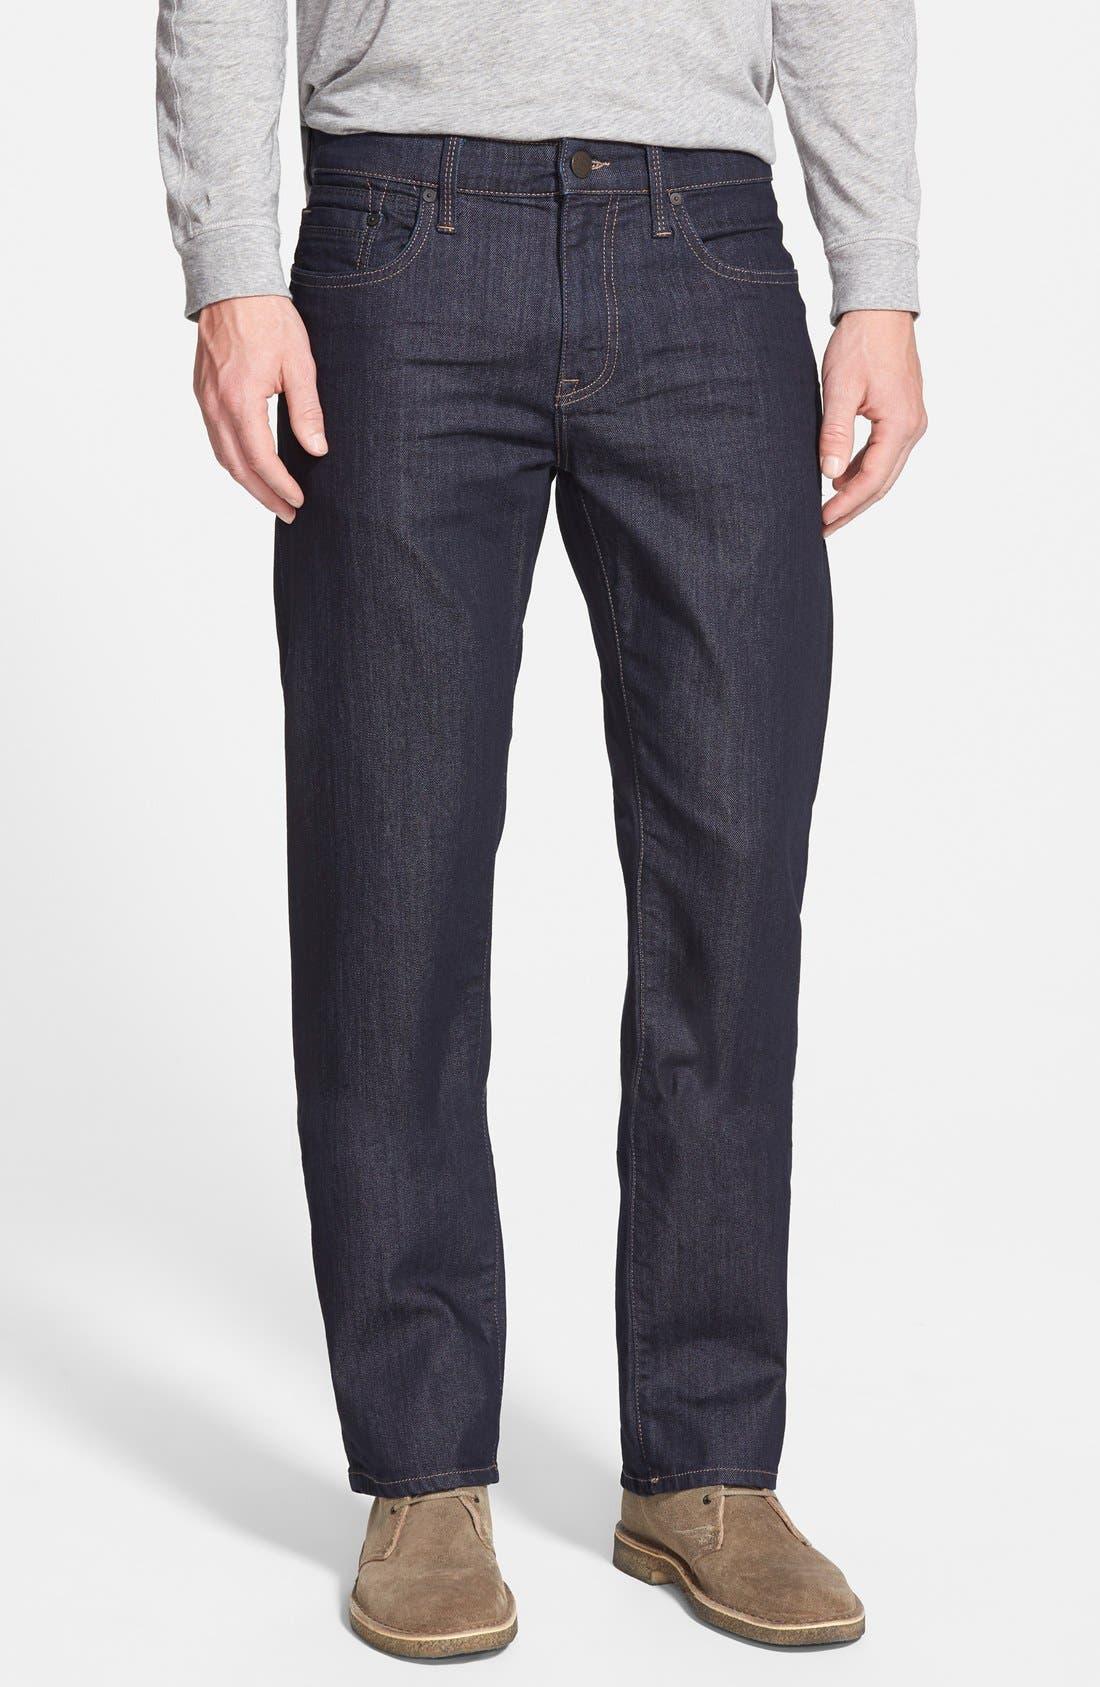 Main Image - Mavi Jeans Zach Straight Leg Jeans (Rinse Williamsburg) (Regular & Tall)